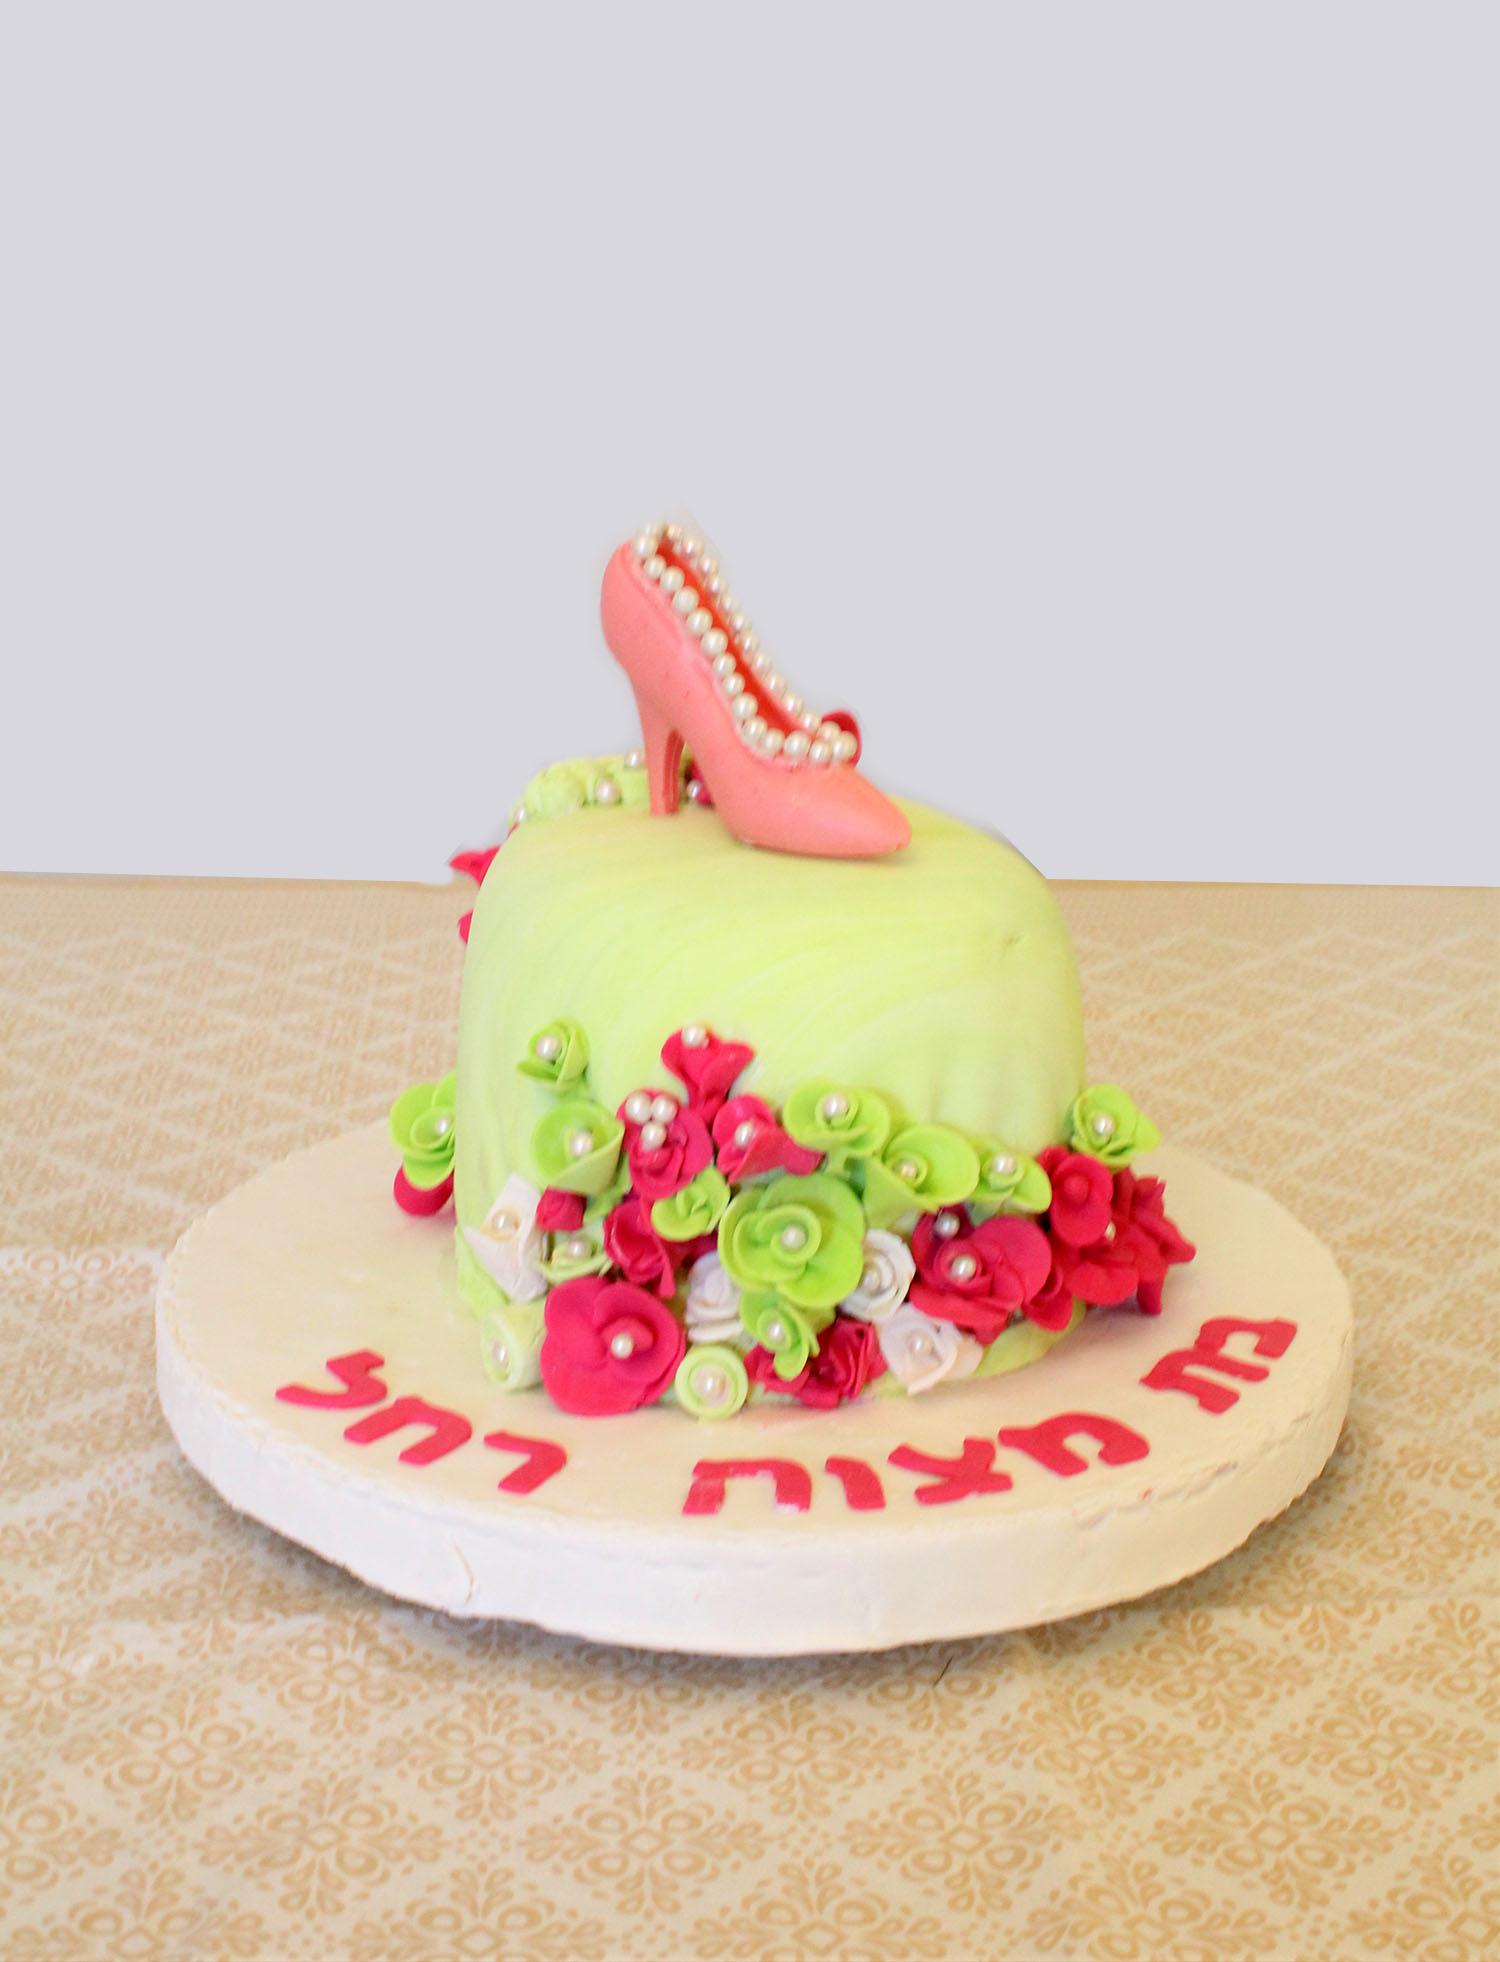 IMG 6334 - עוגה לבת מצוה